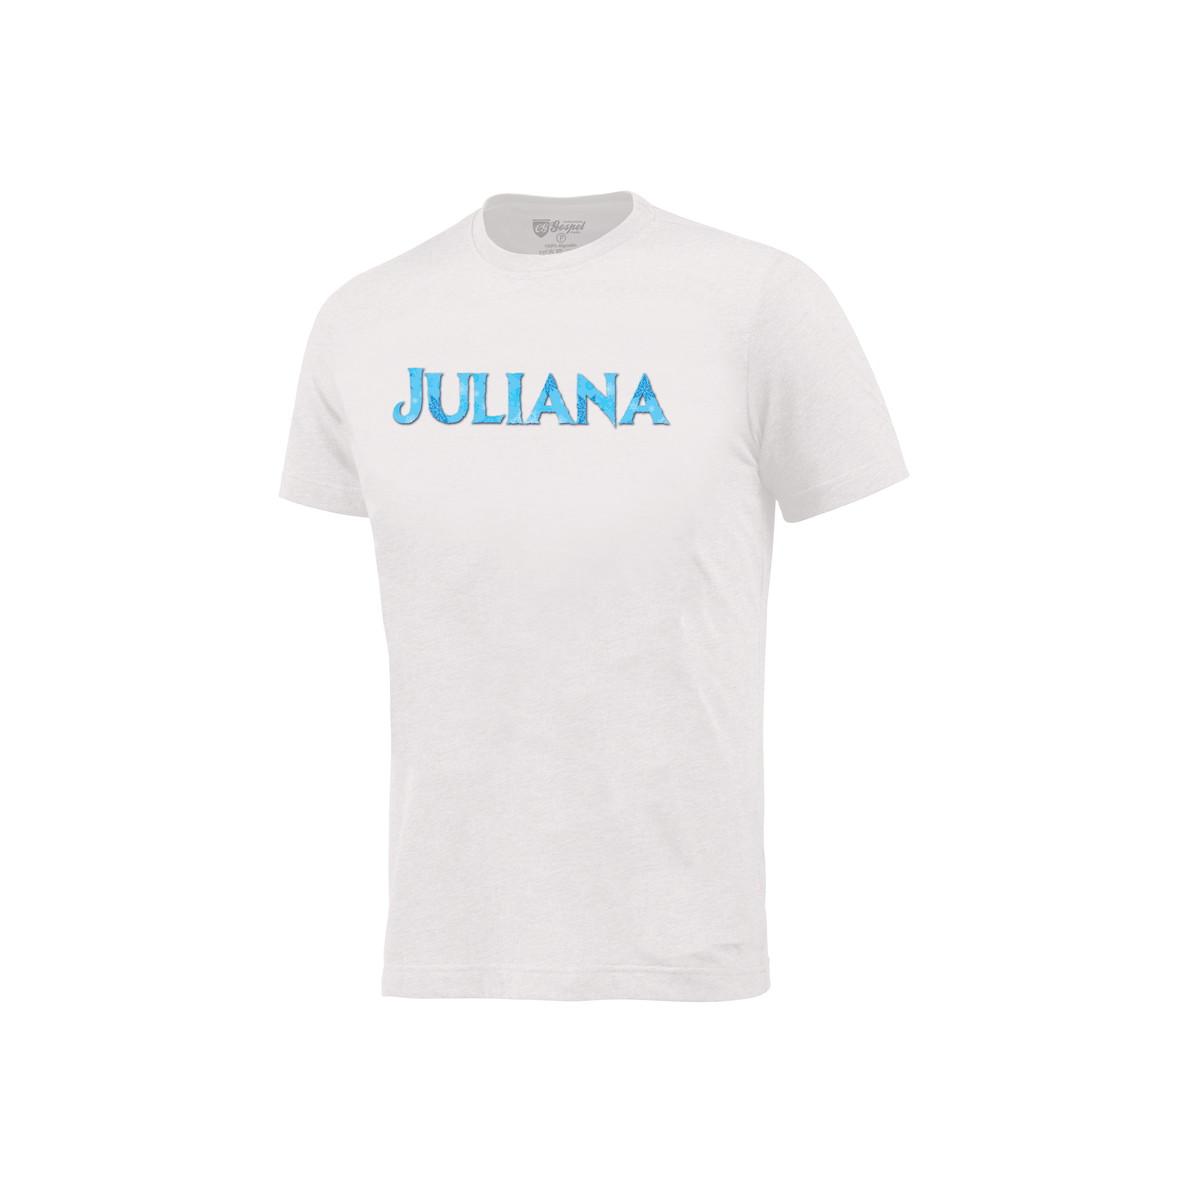 01d6ff1373 Camisa Personalizada Frozen no Elo7